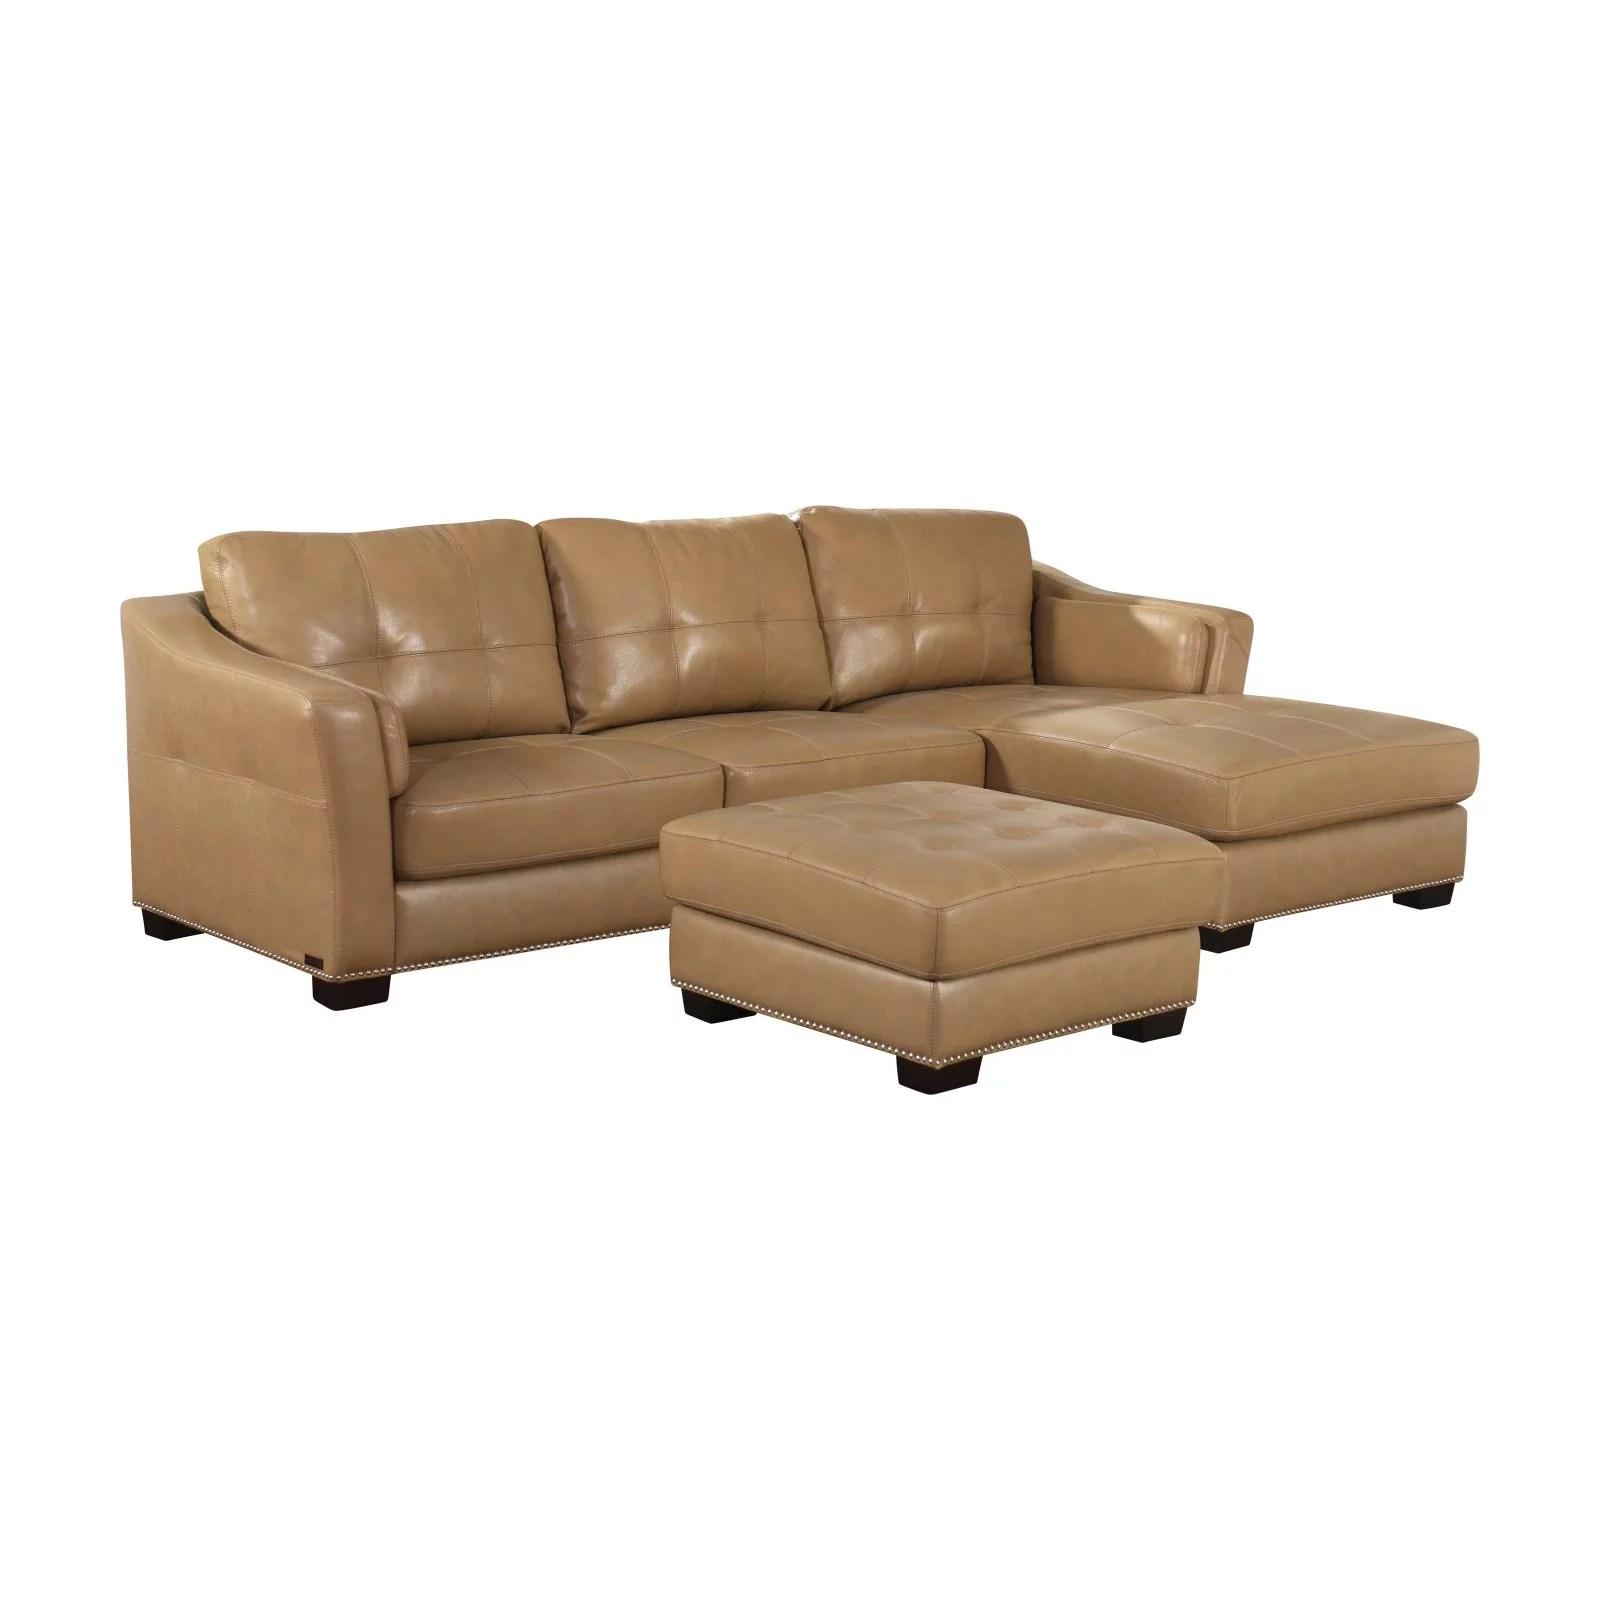 abbyson aspen 2 piece leather sectional walmart com